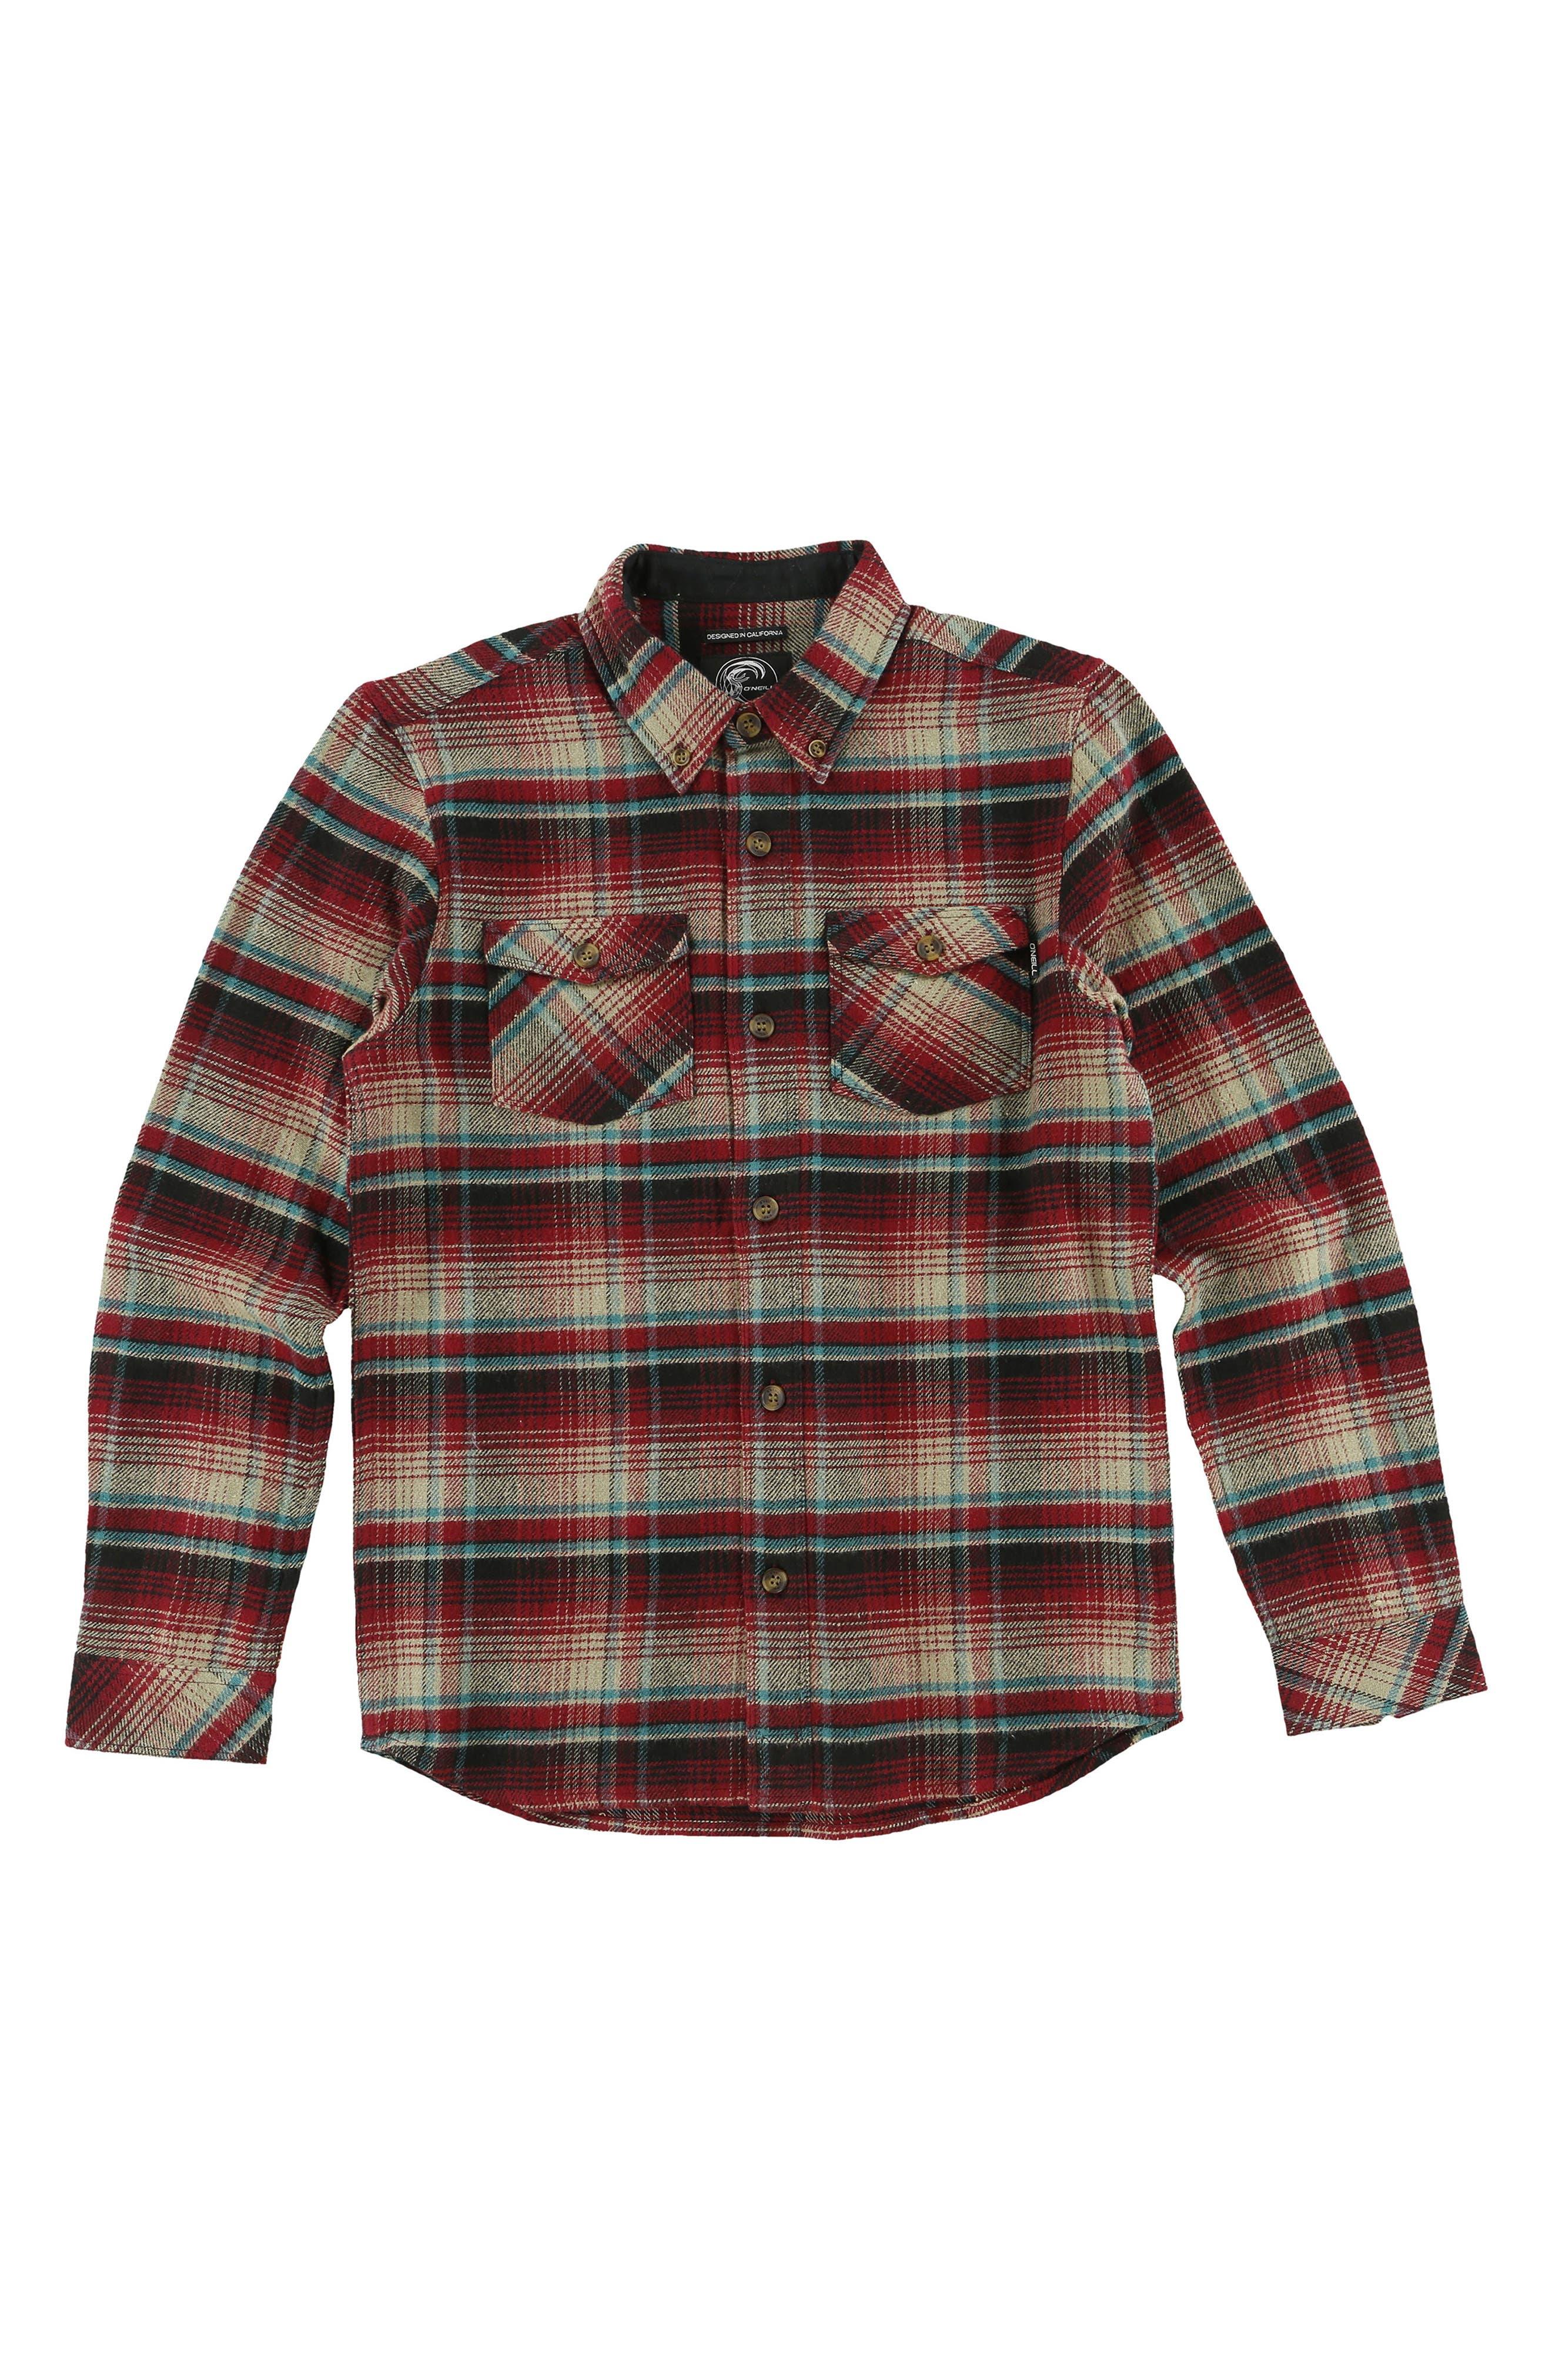 Main Image - O'Neill Butler Plaid Flannel Shirt (Big Boys)